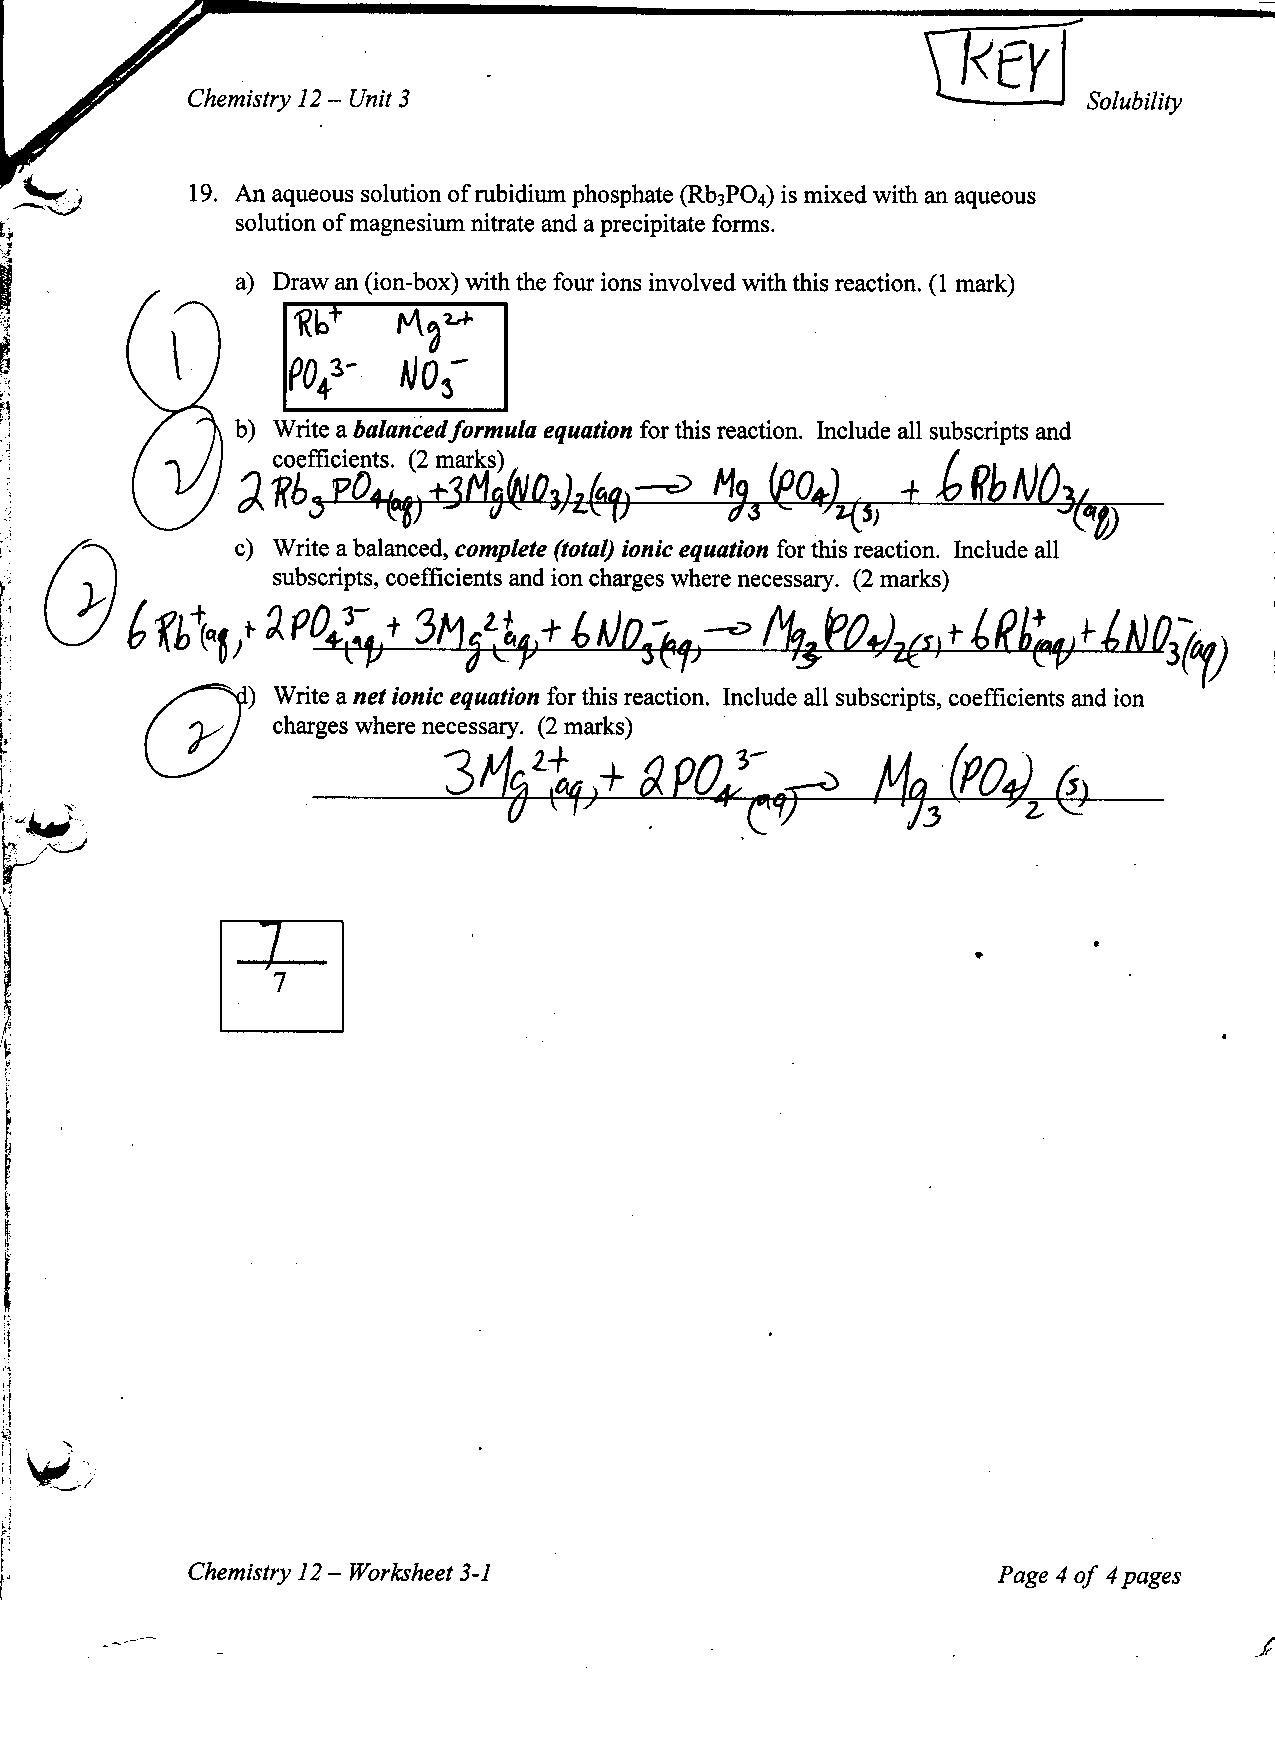 Chemistry Of Life Worksheet Chemistry 12 Worksheet 4 6 Answers